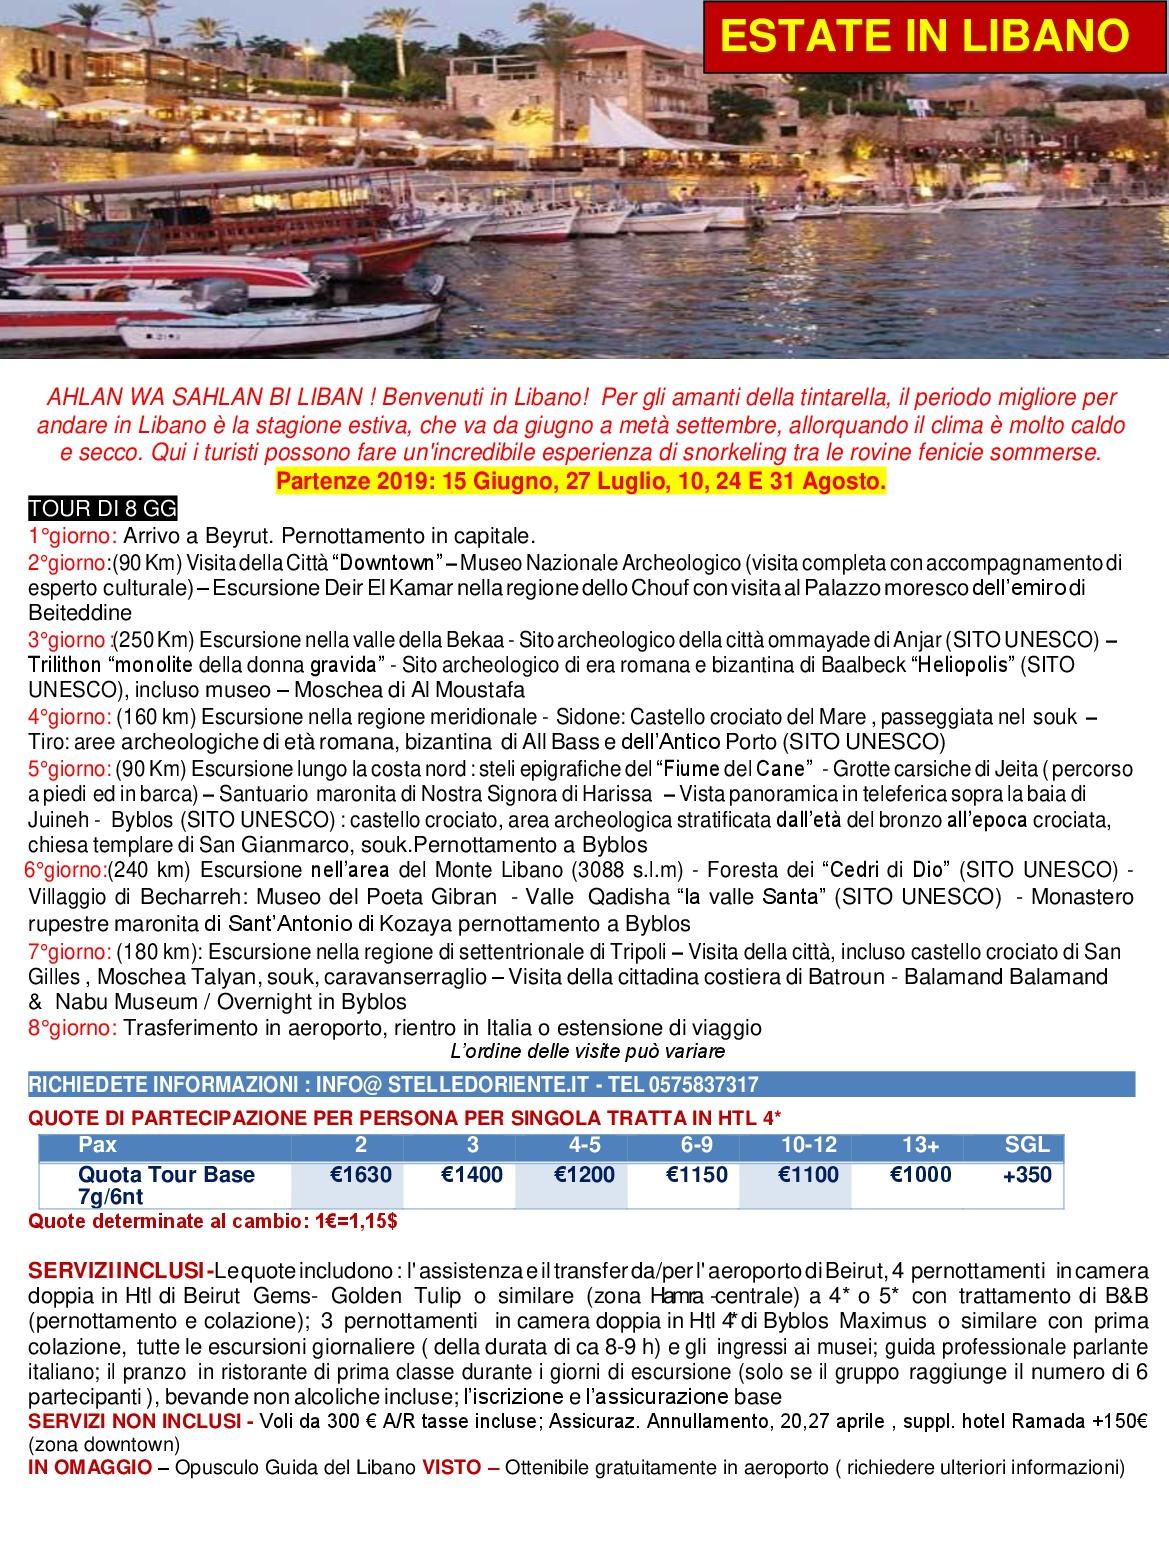 LOCANDINA  estate in LIBANO TOUR 2019-001jpg